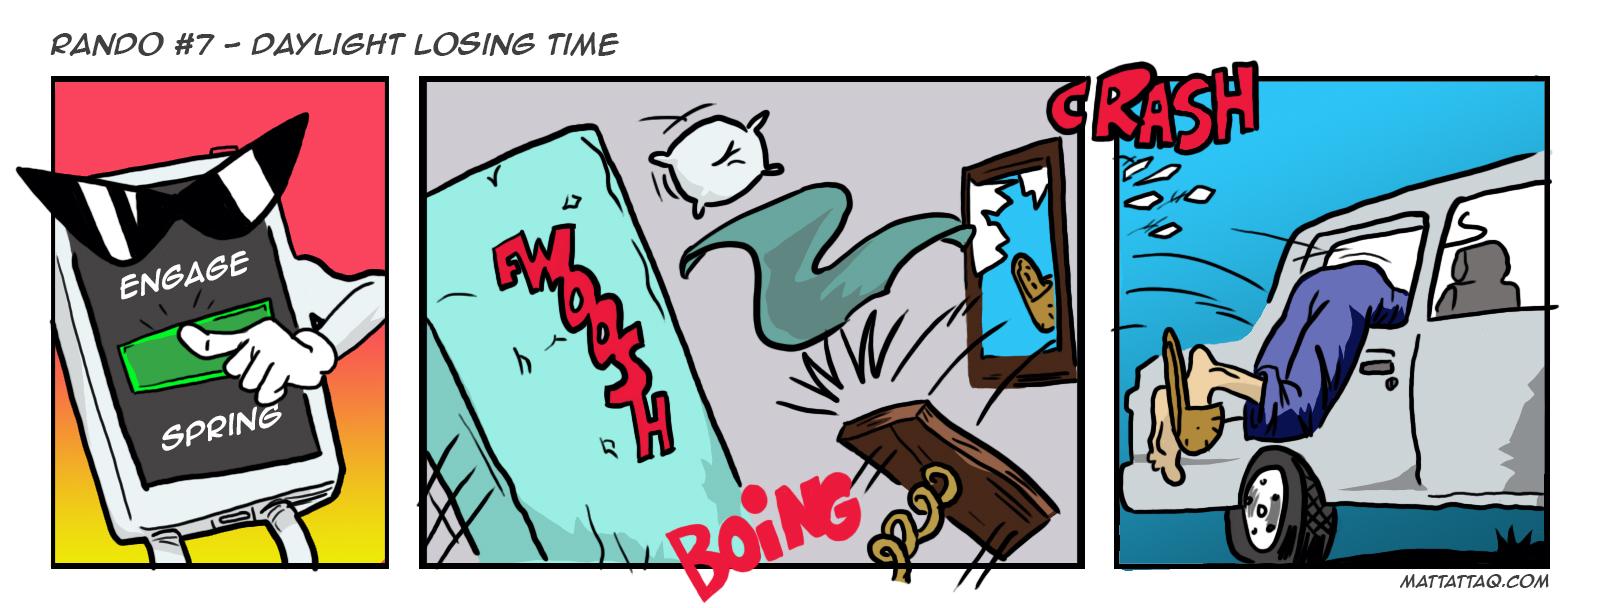 Rando 07 – Daylight Losing Time